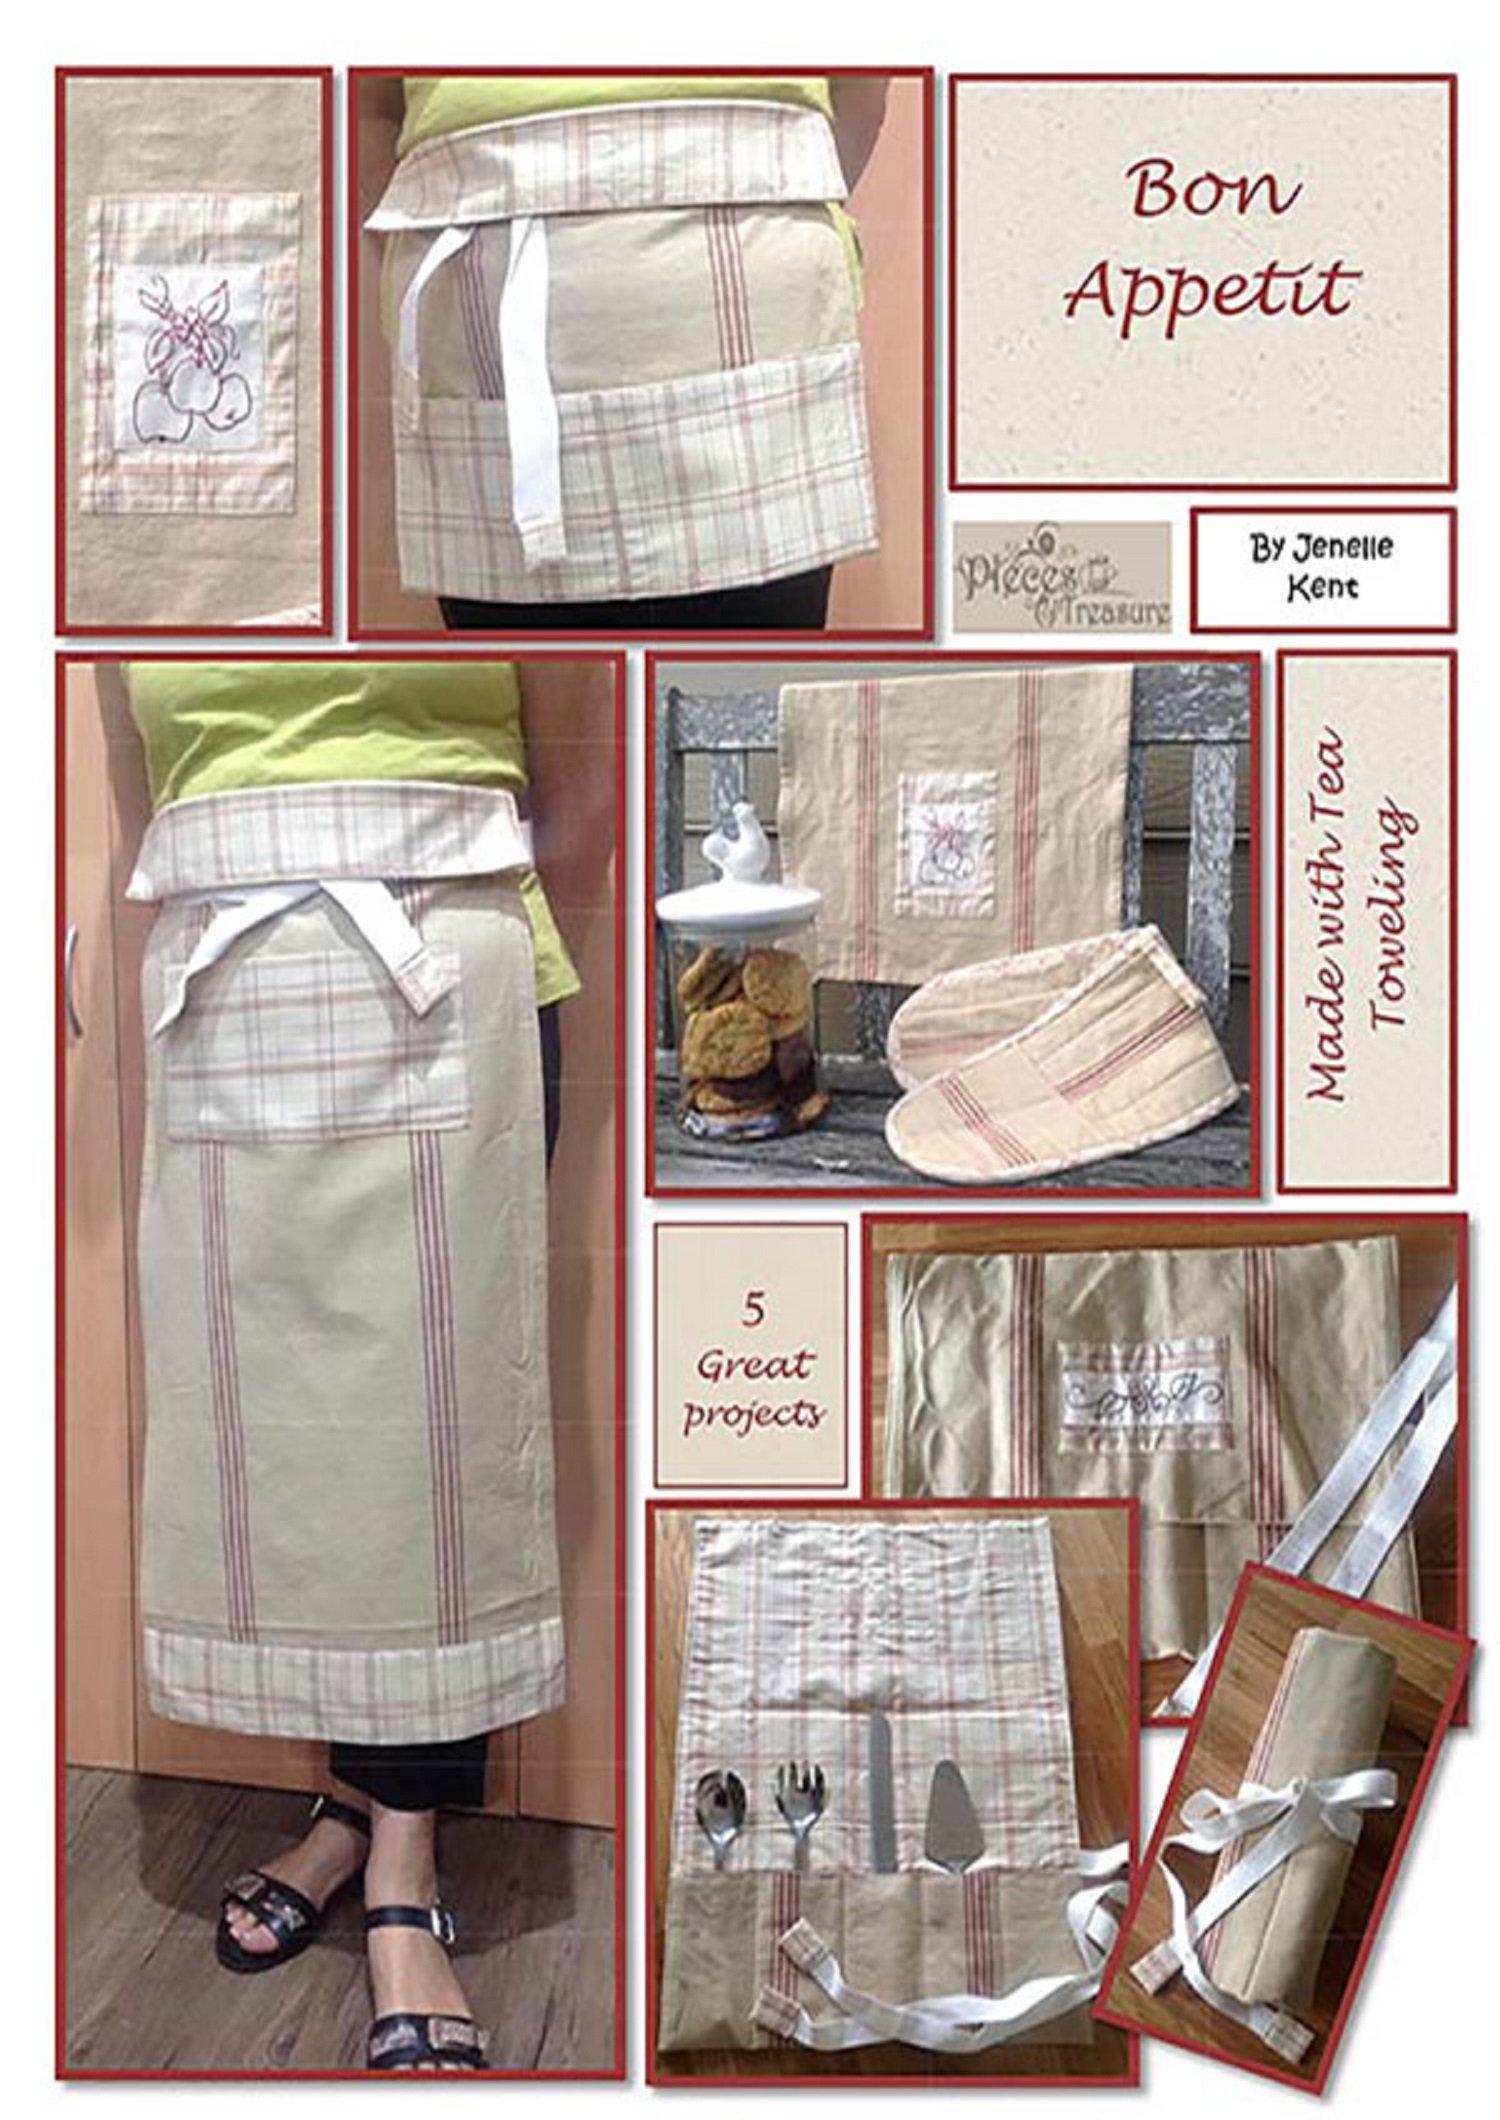 Bon Appetit Sewing Pattern, by Jenelle Kent